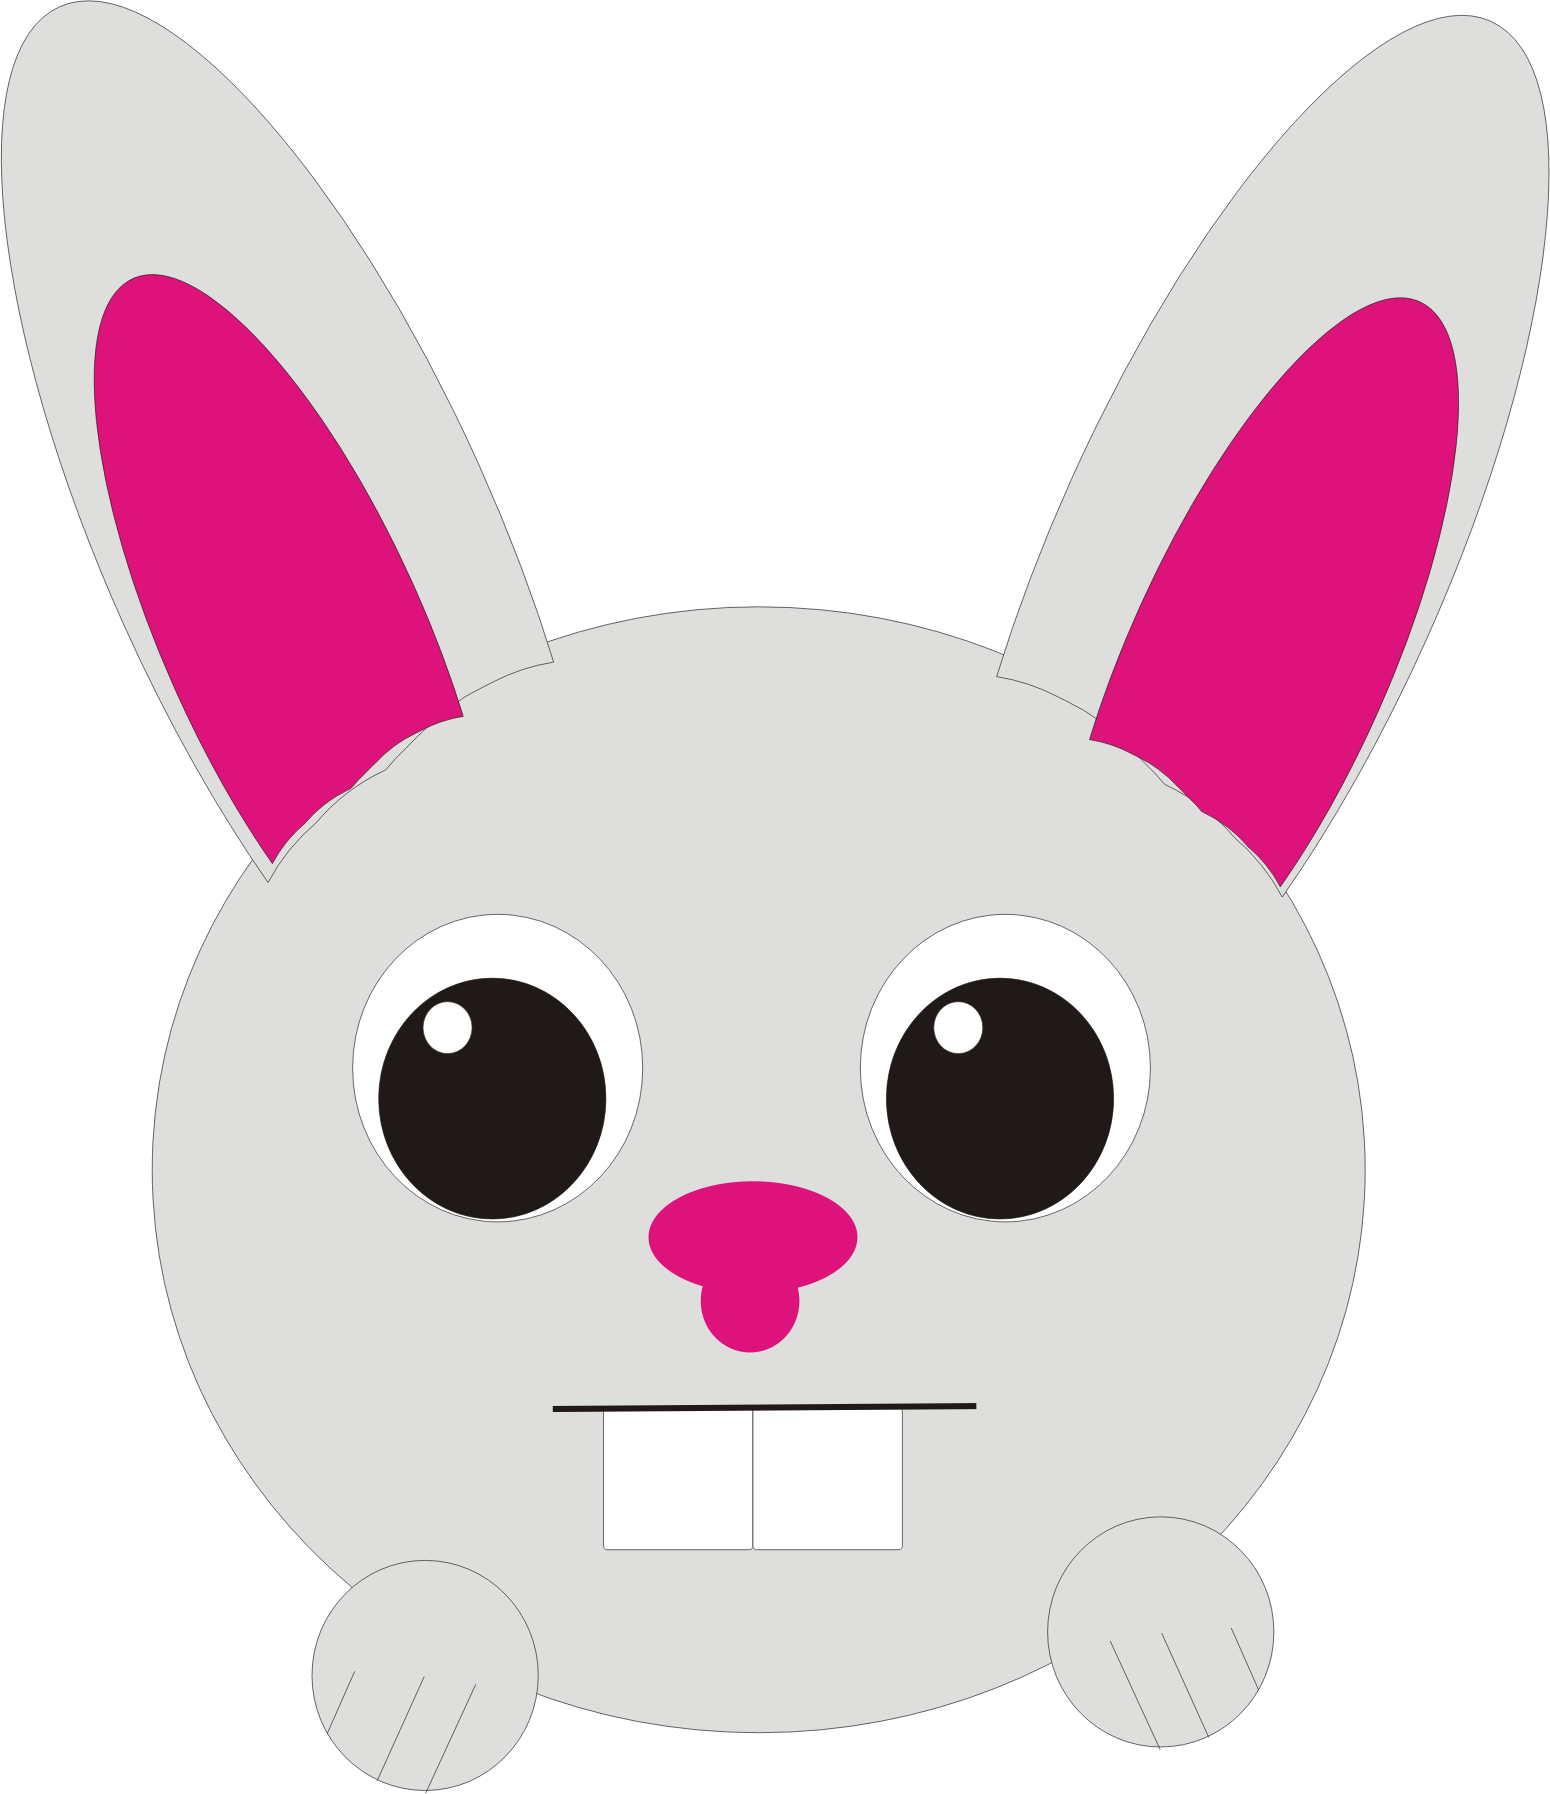 Gambar Clipart Rabbit Big Image Png Gambar Kelinci Animasi Lucu Di